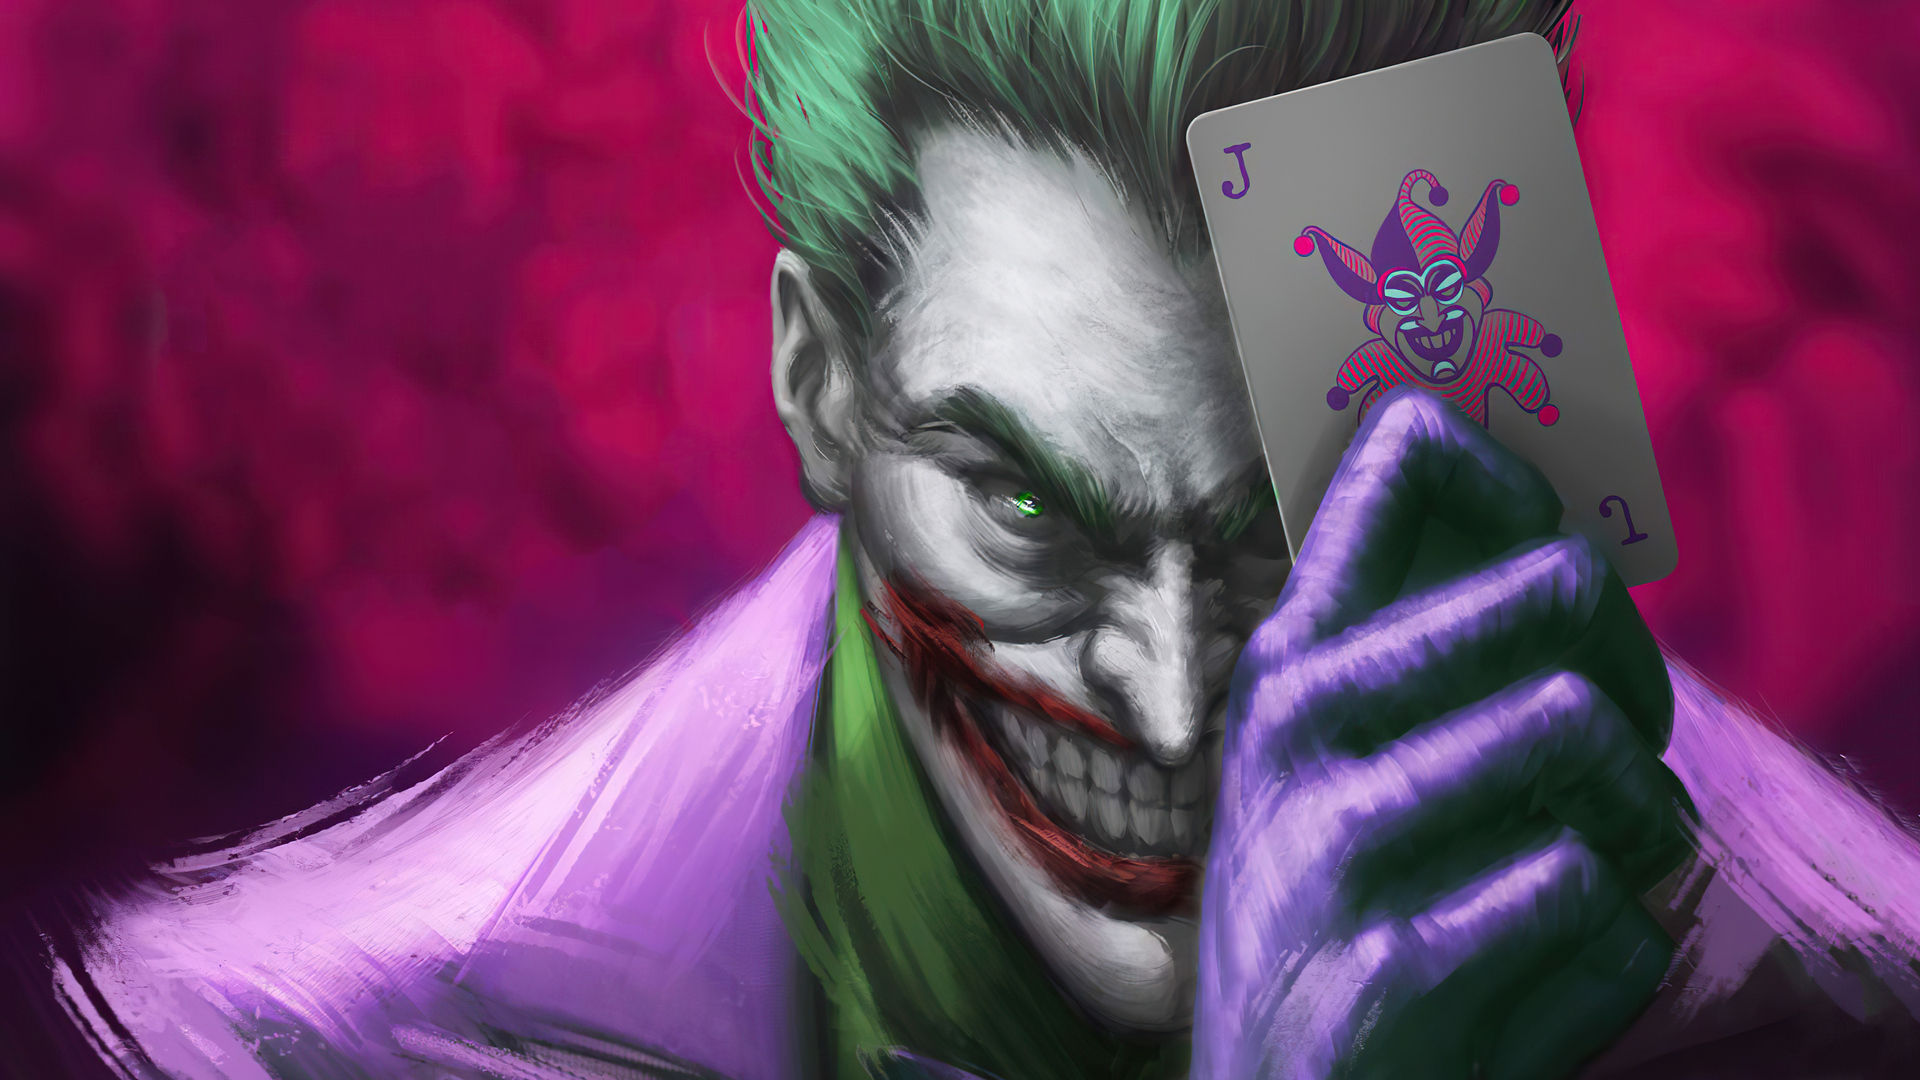 Joker Play Card 4k Wallpaper